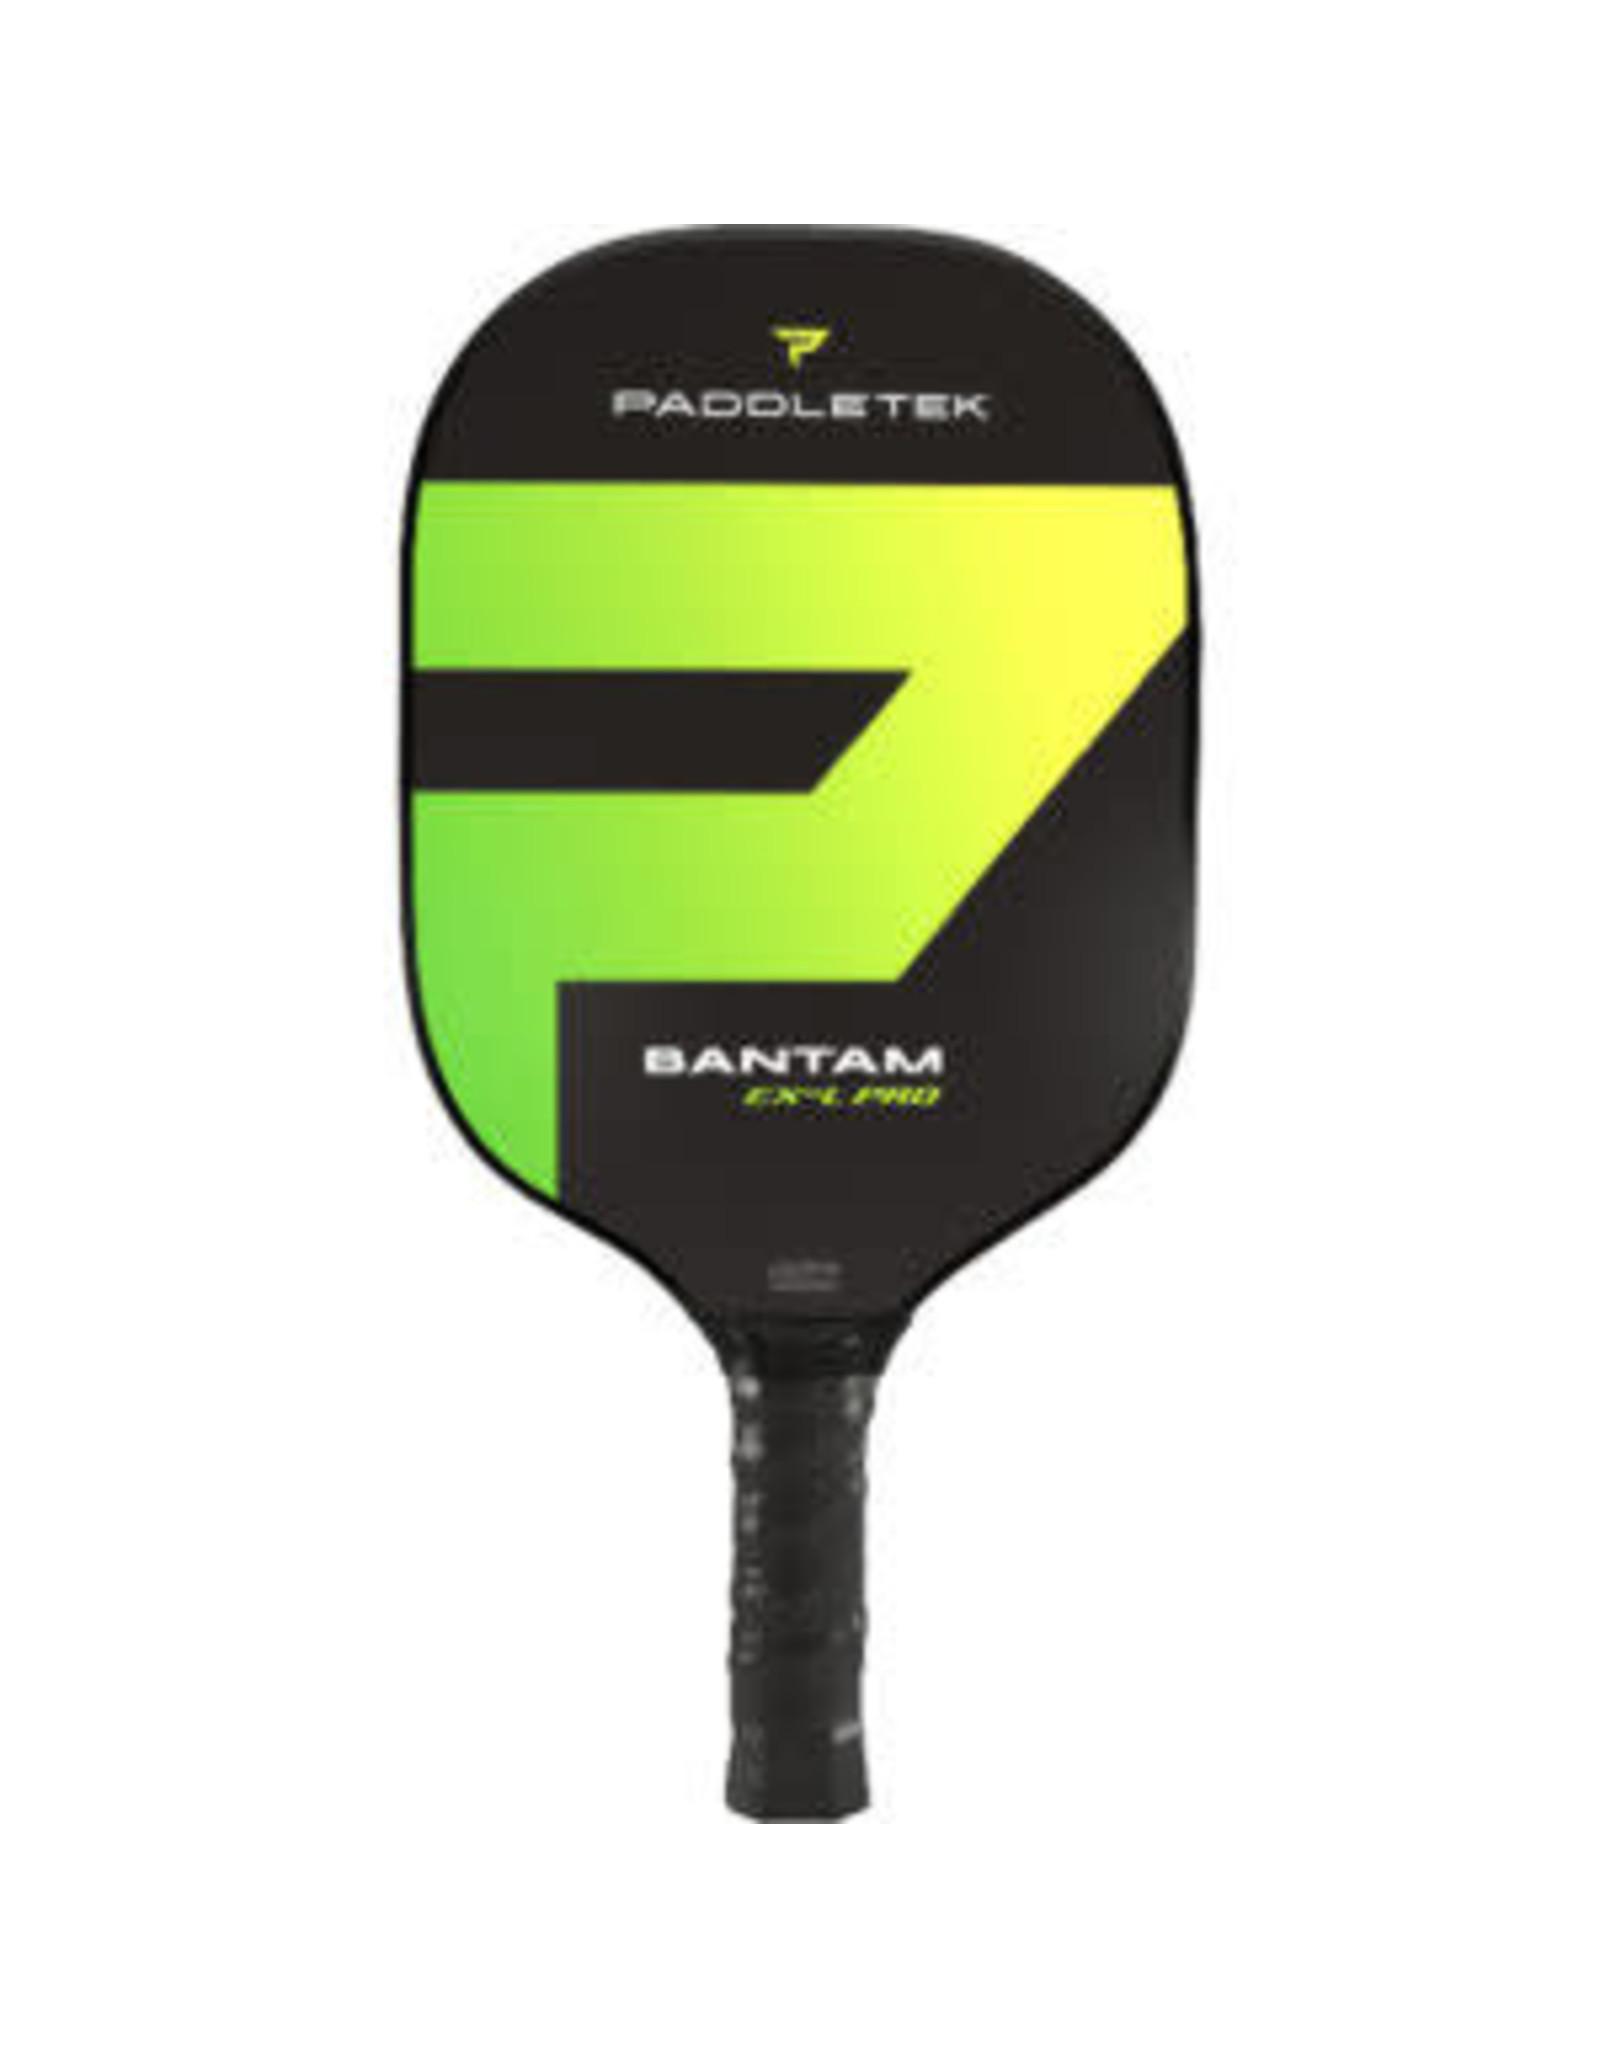 Paddletek Paddletek Bantam EX-L Pro Pickleball Paddle